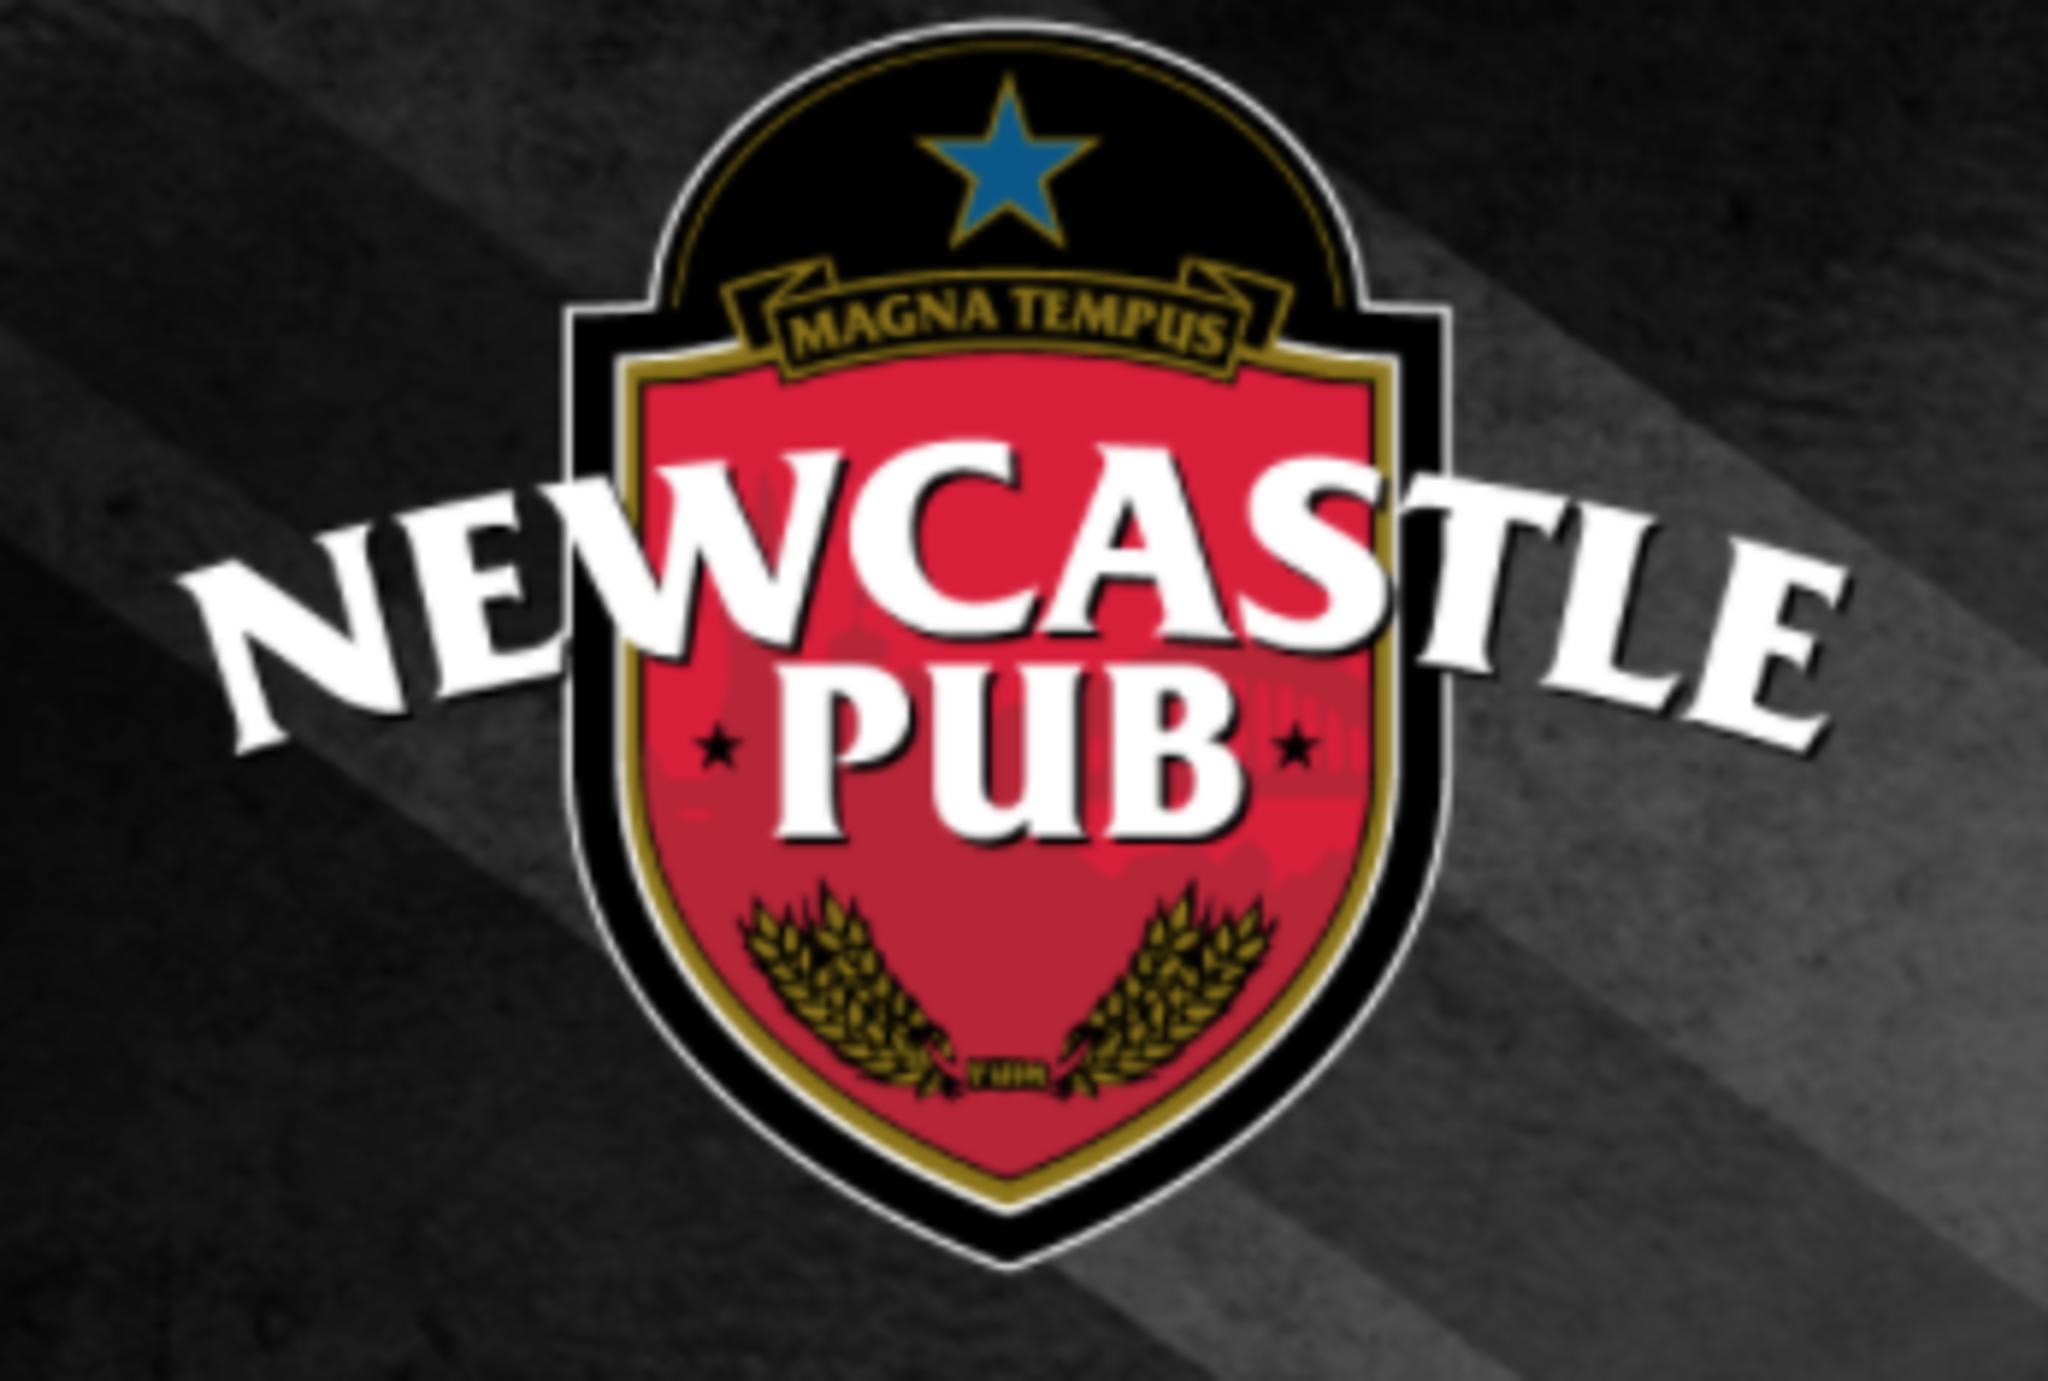 Newcastle Pub